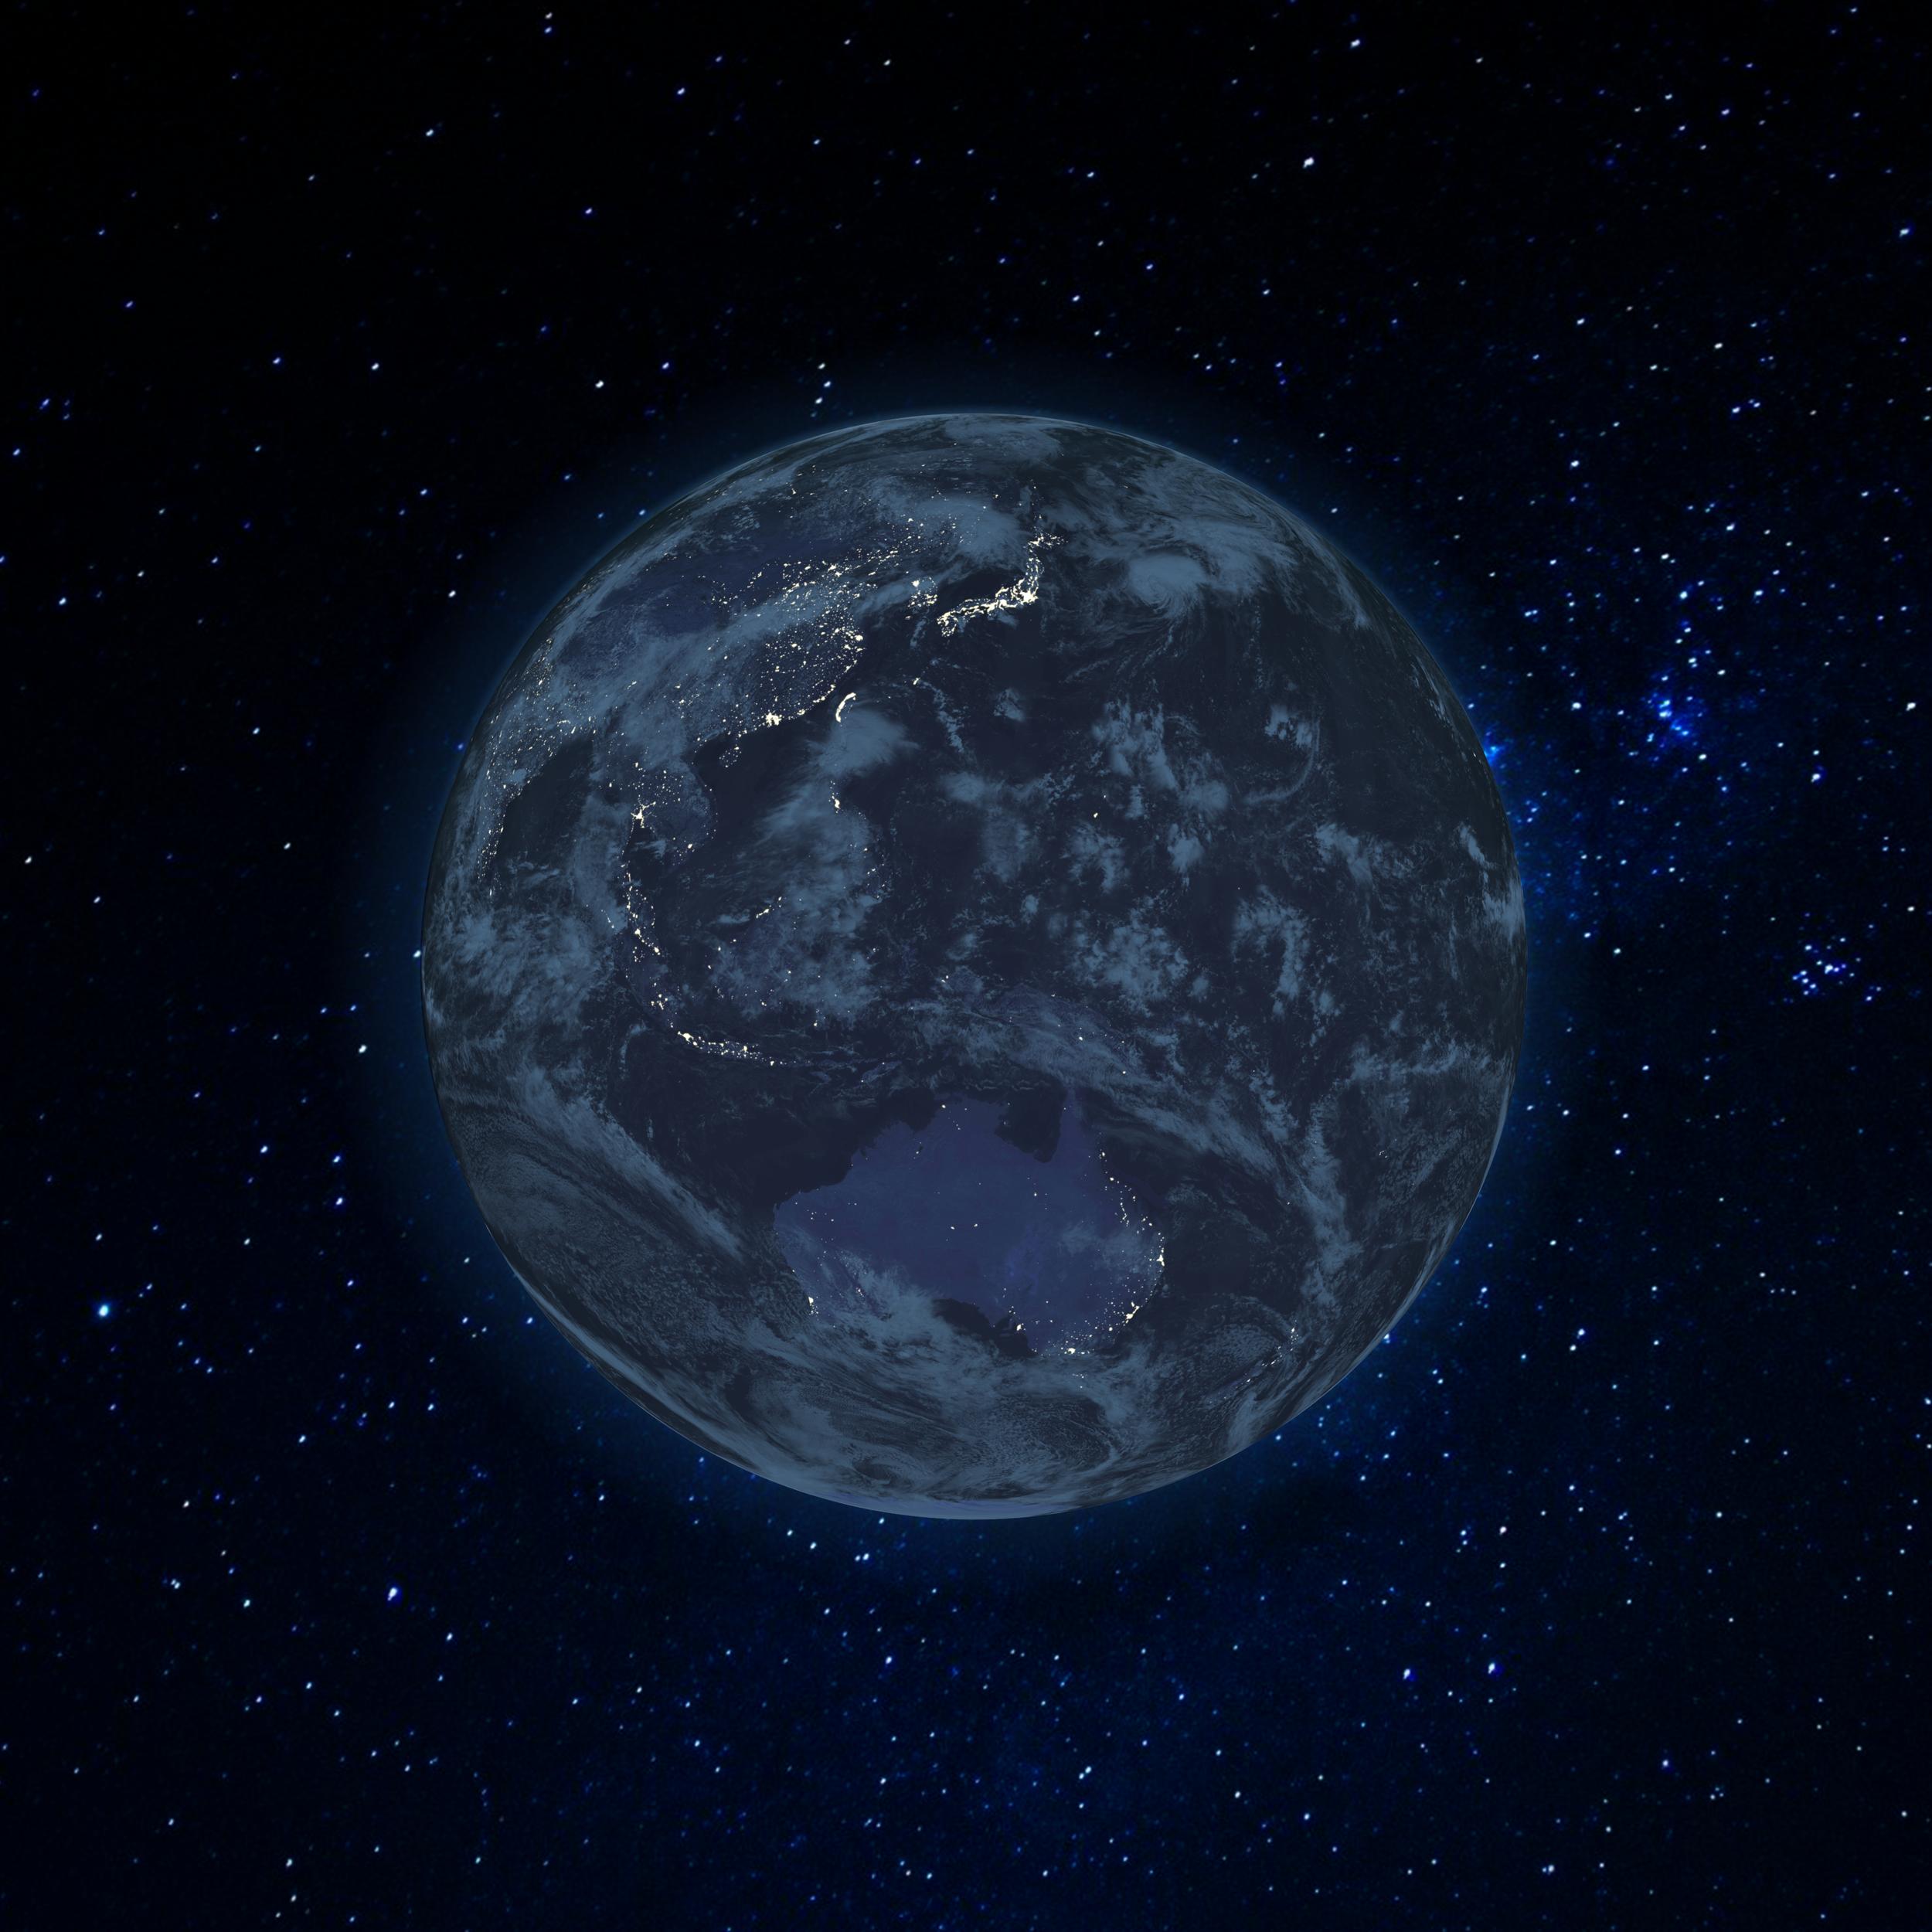 Earth_orbit_4000x4000_0117.png